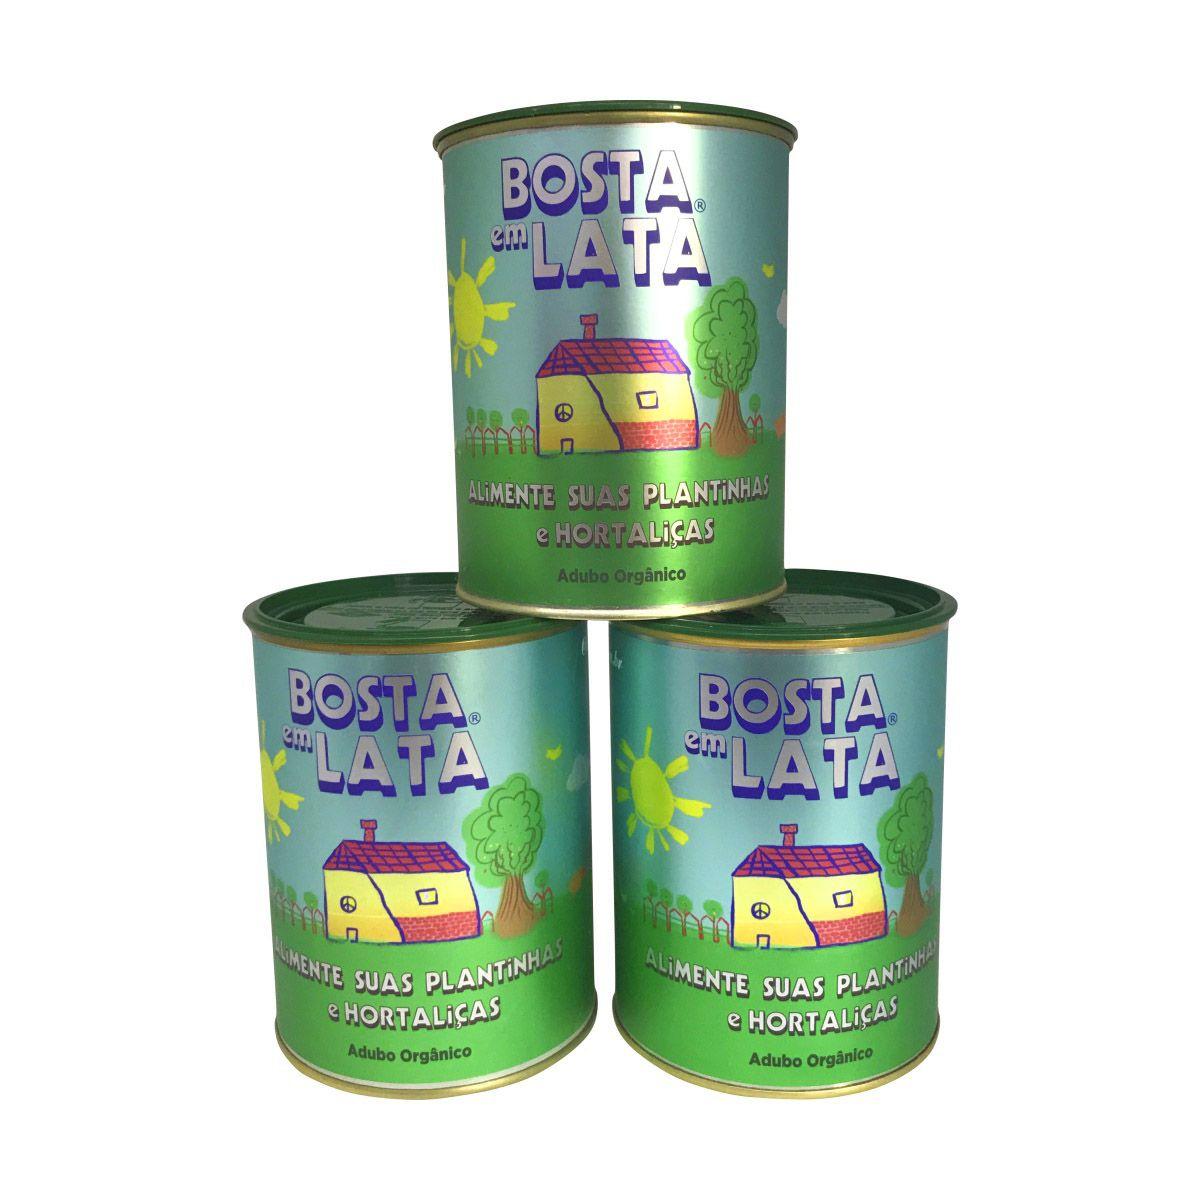 Kit 3 latas de Adubo Orgânico Bosta em Lata 500g